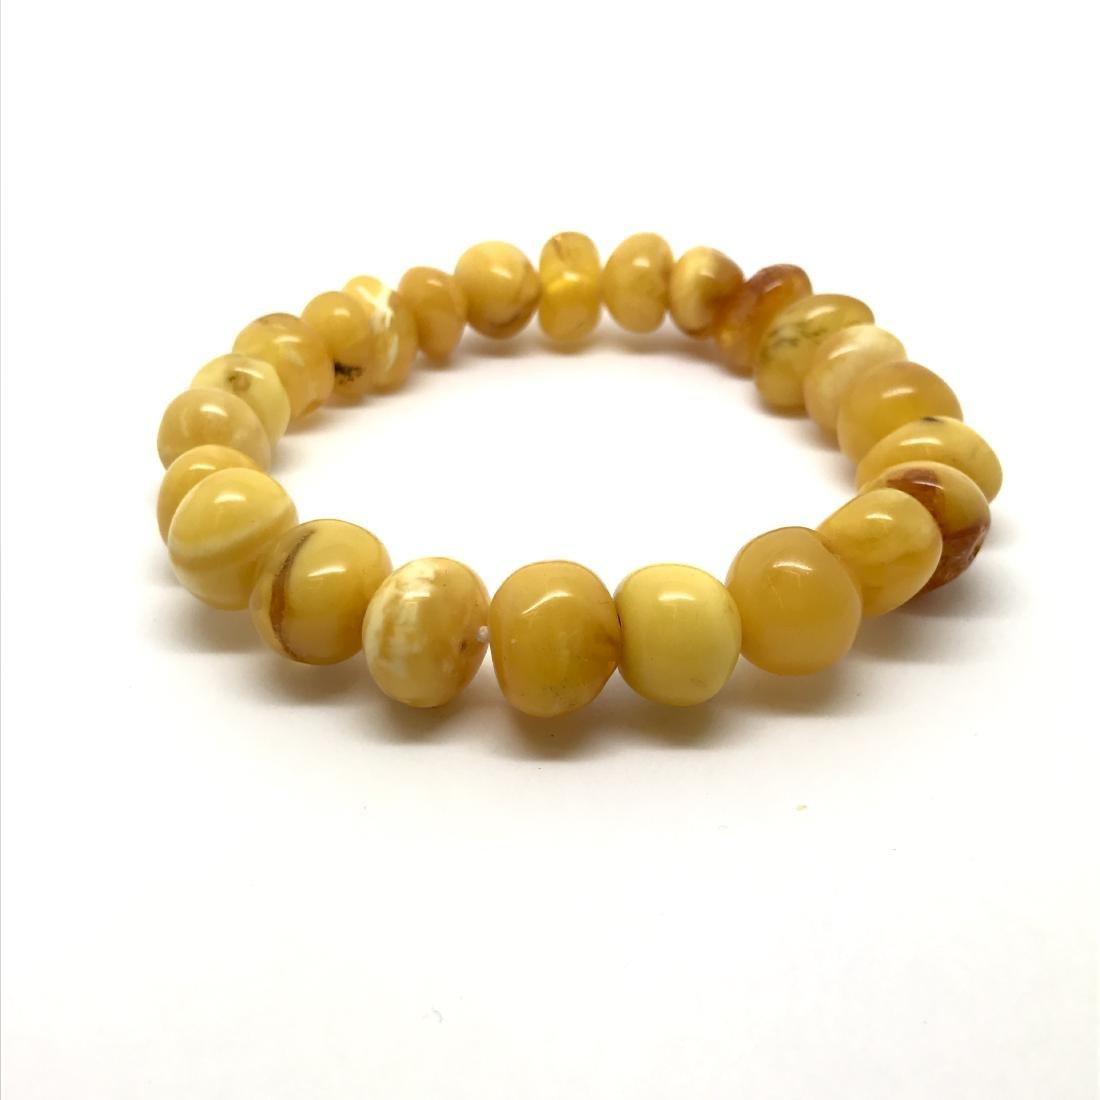 Antique Baltic amber beads bracelet 18.2 gr